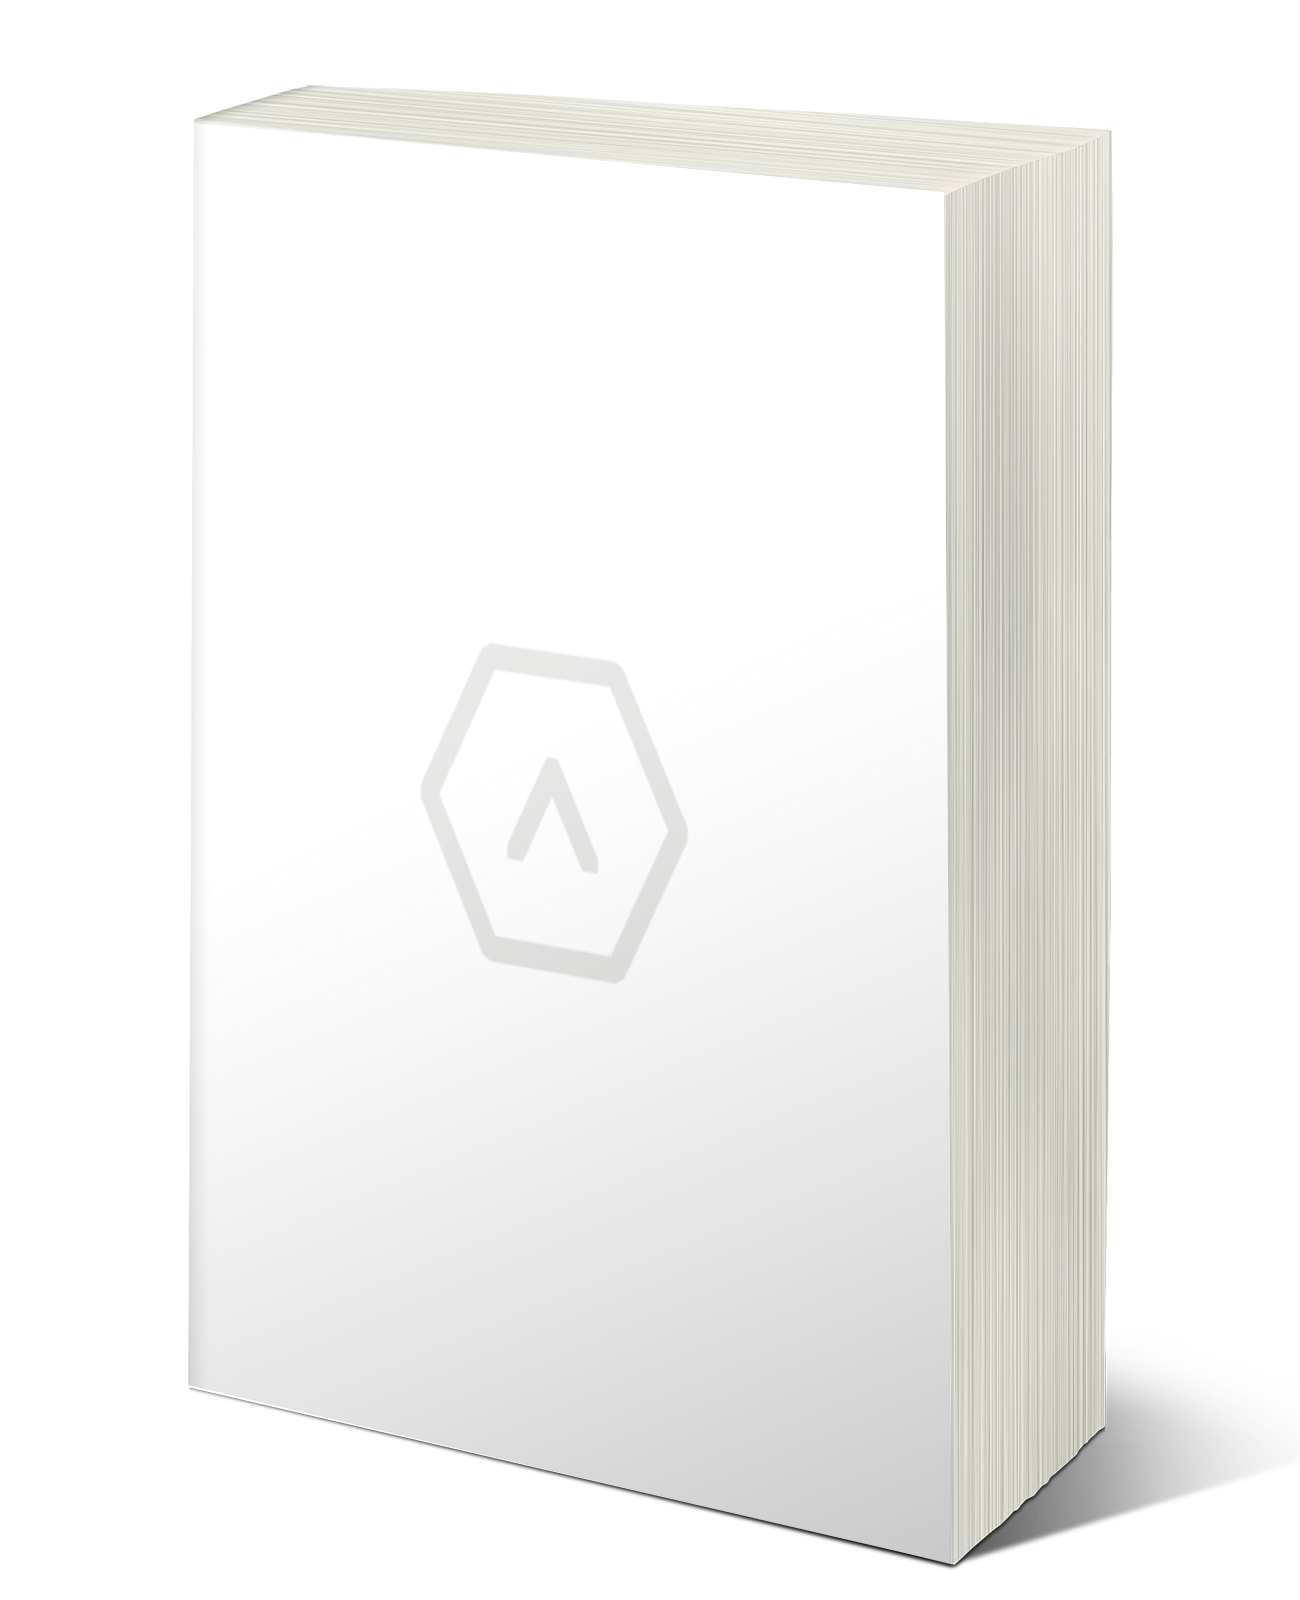 AKBM_CTA_Brand Book_3D Book_v1